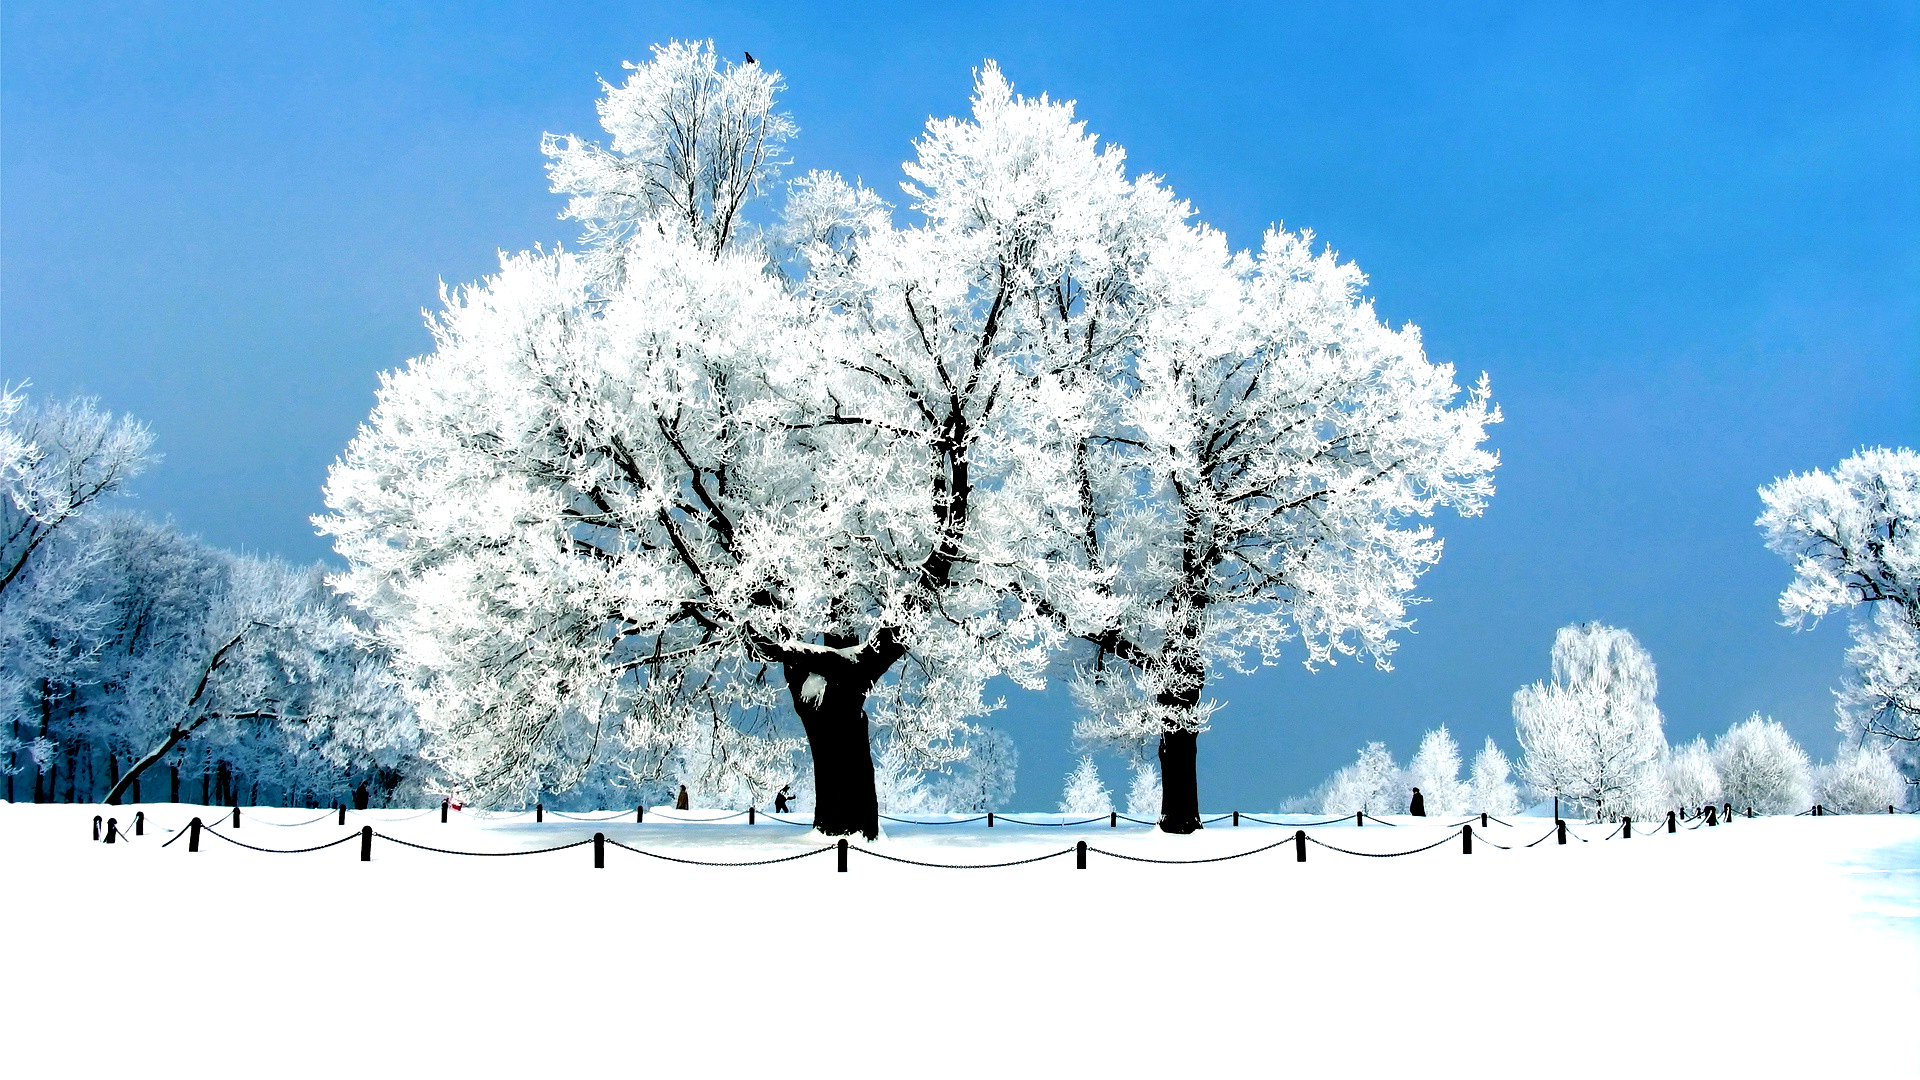 Winter Wallpapers Full Hd Winter Wallpaper Fondecraniphonemarbre Winter Wallp Winter Wallpapers Full Hd Winter Wallpaper Fondecranip 2020 Arka Plan Fonlar